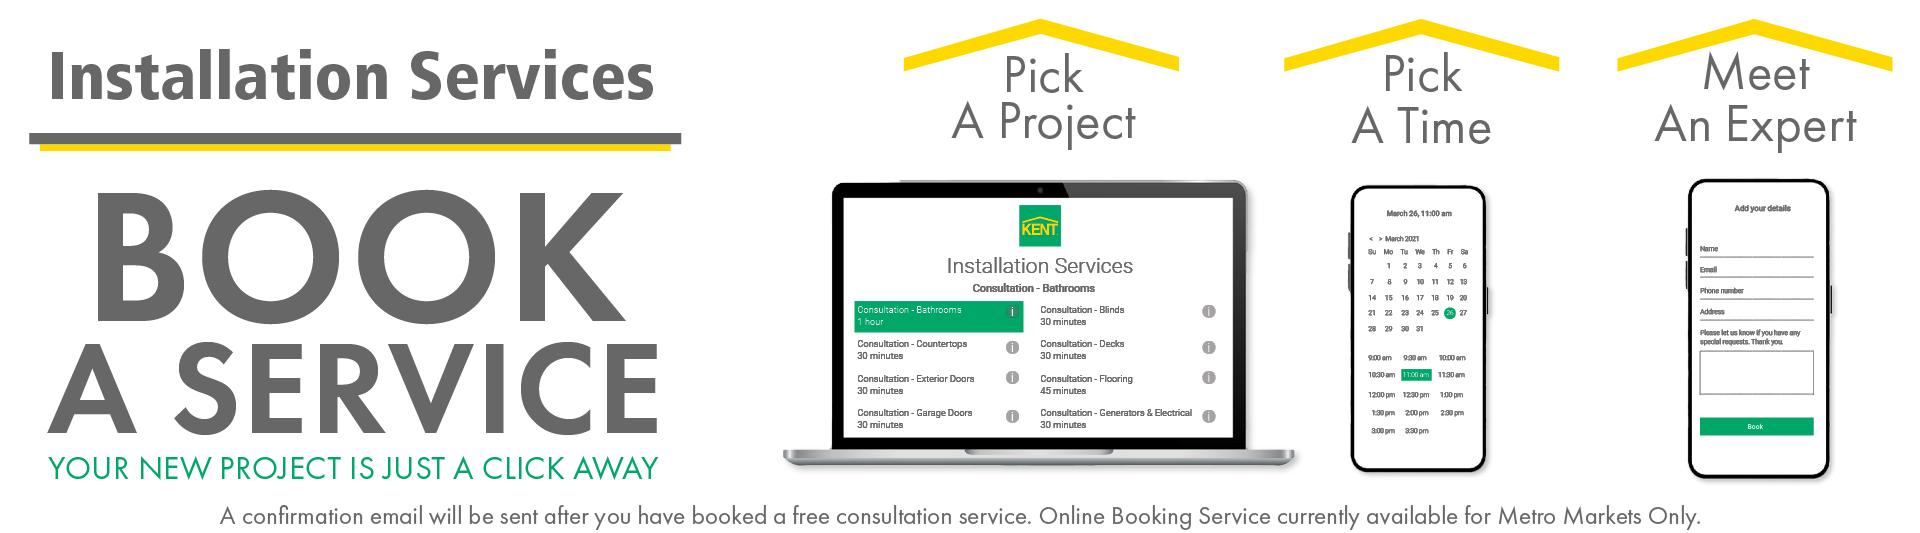 Installation Services - Book a Service